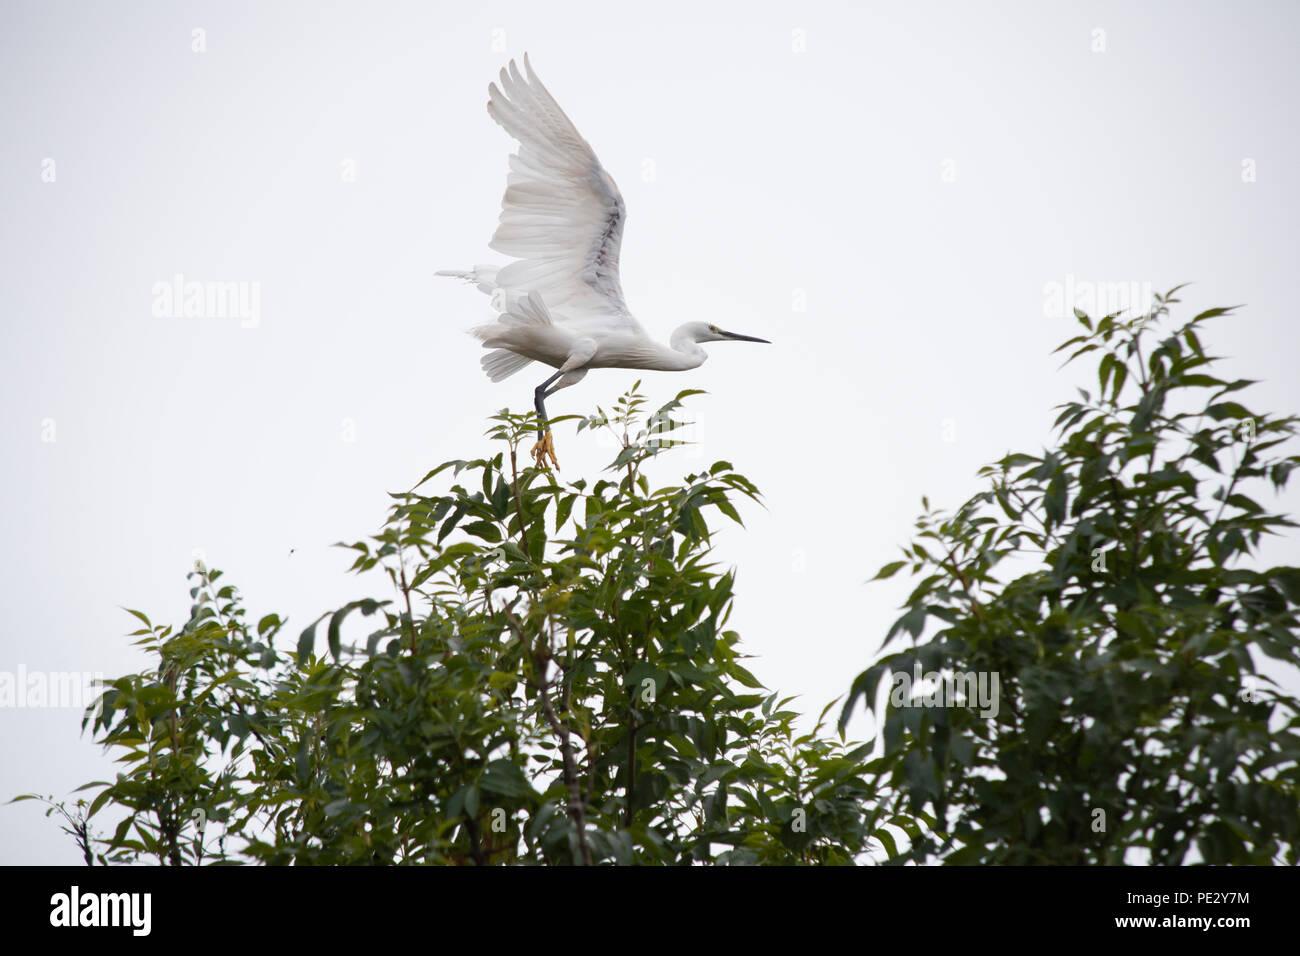 Little Egret,(Egretta garzetta), taking flight, Brent River, near Brent Reservoir, also known as Welsh Harp Reservoir, north London, United Kingdom - Stock Image